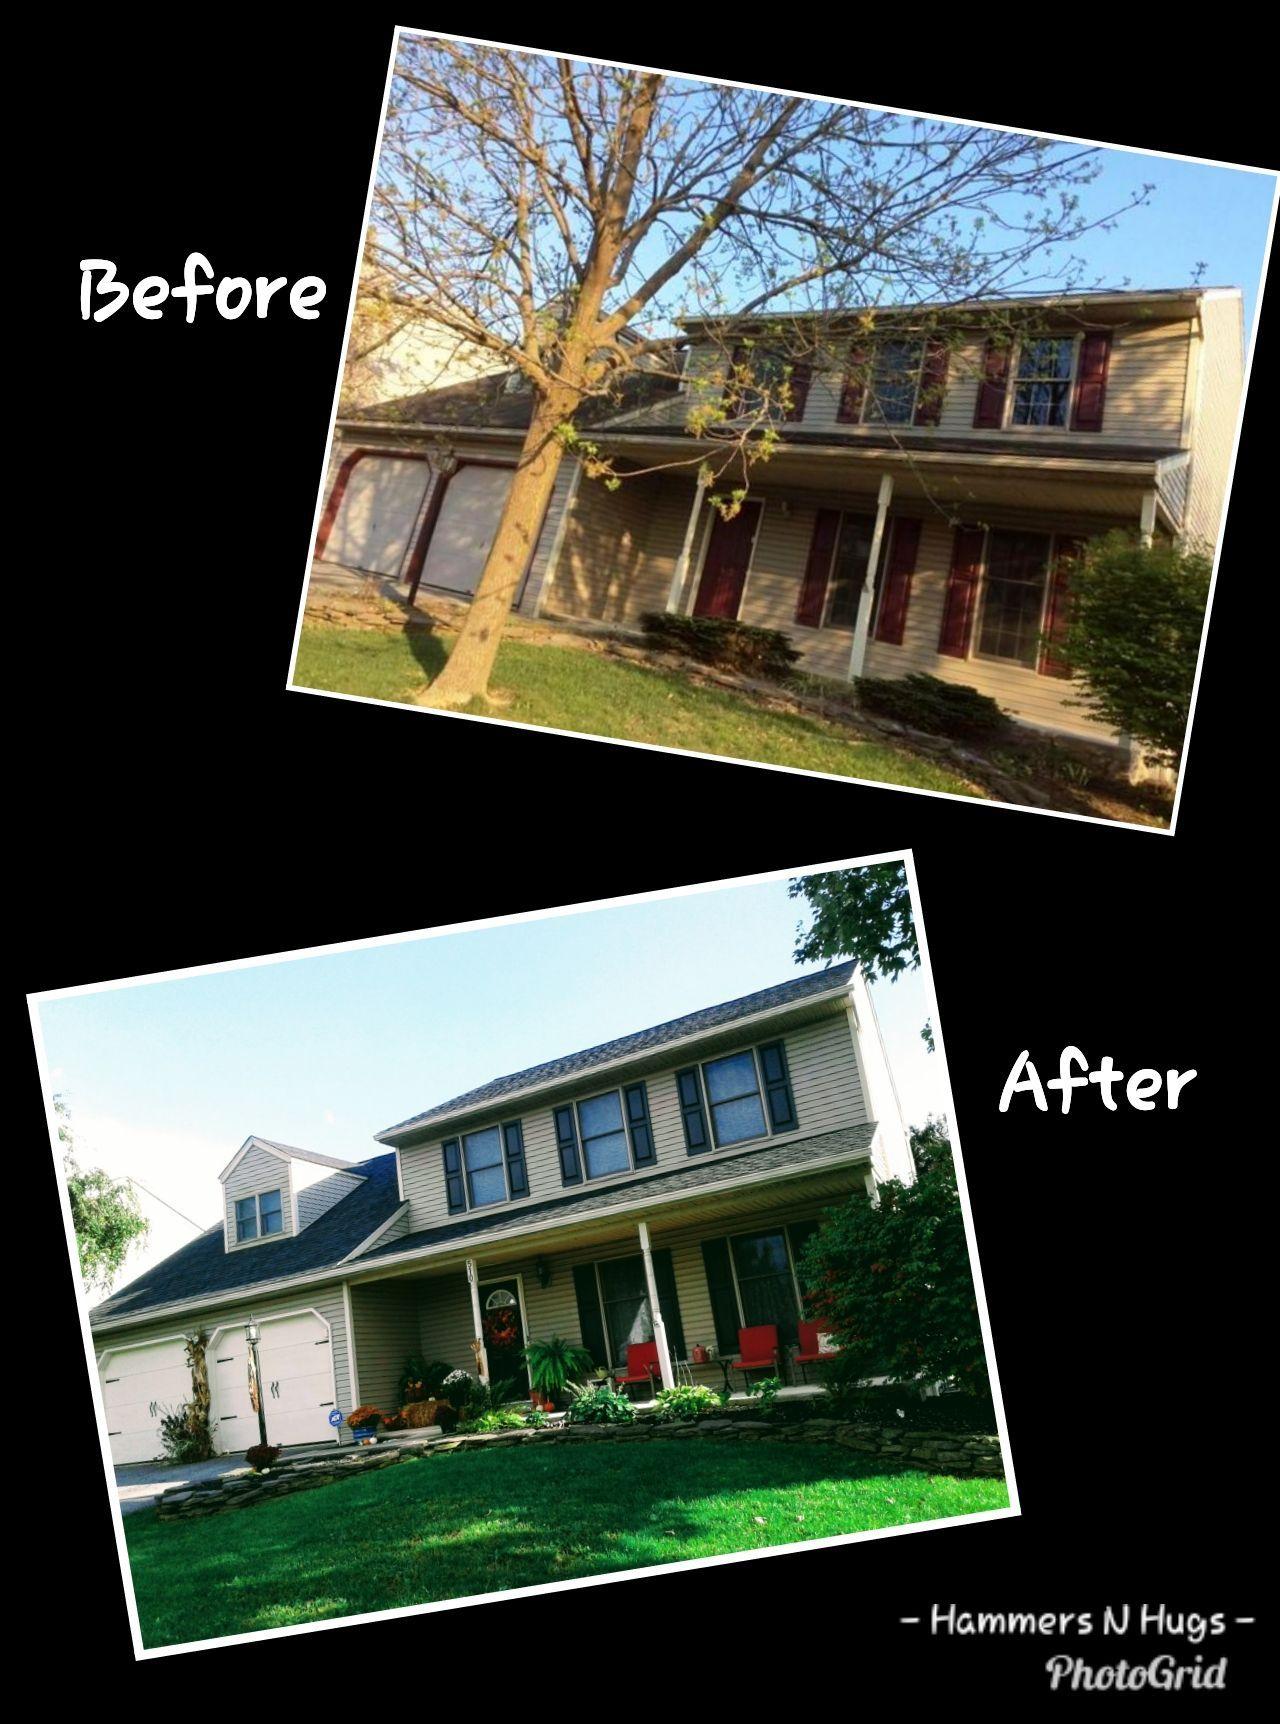 Forclosure Remodel: Home Remodeling, Diy Home Decor, Diy